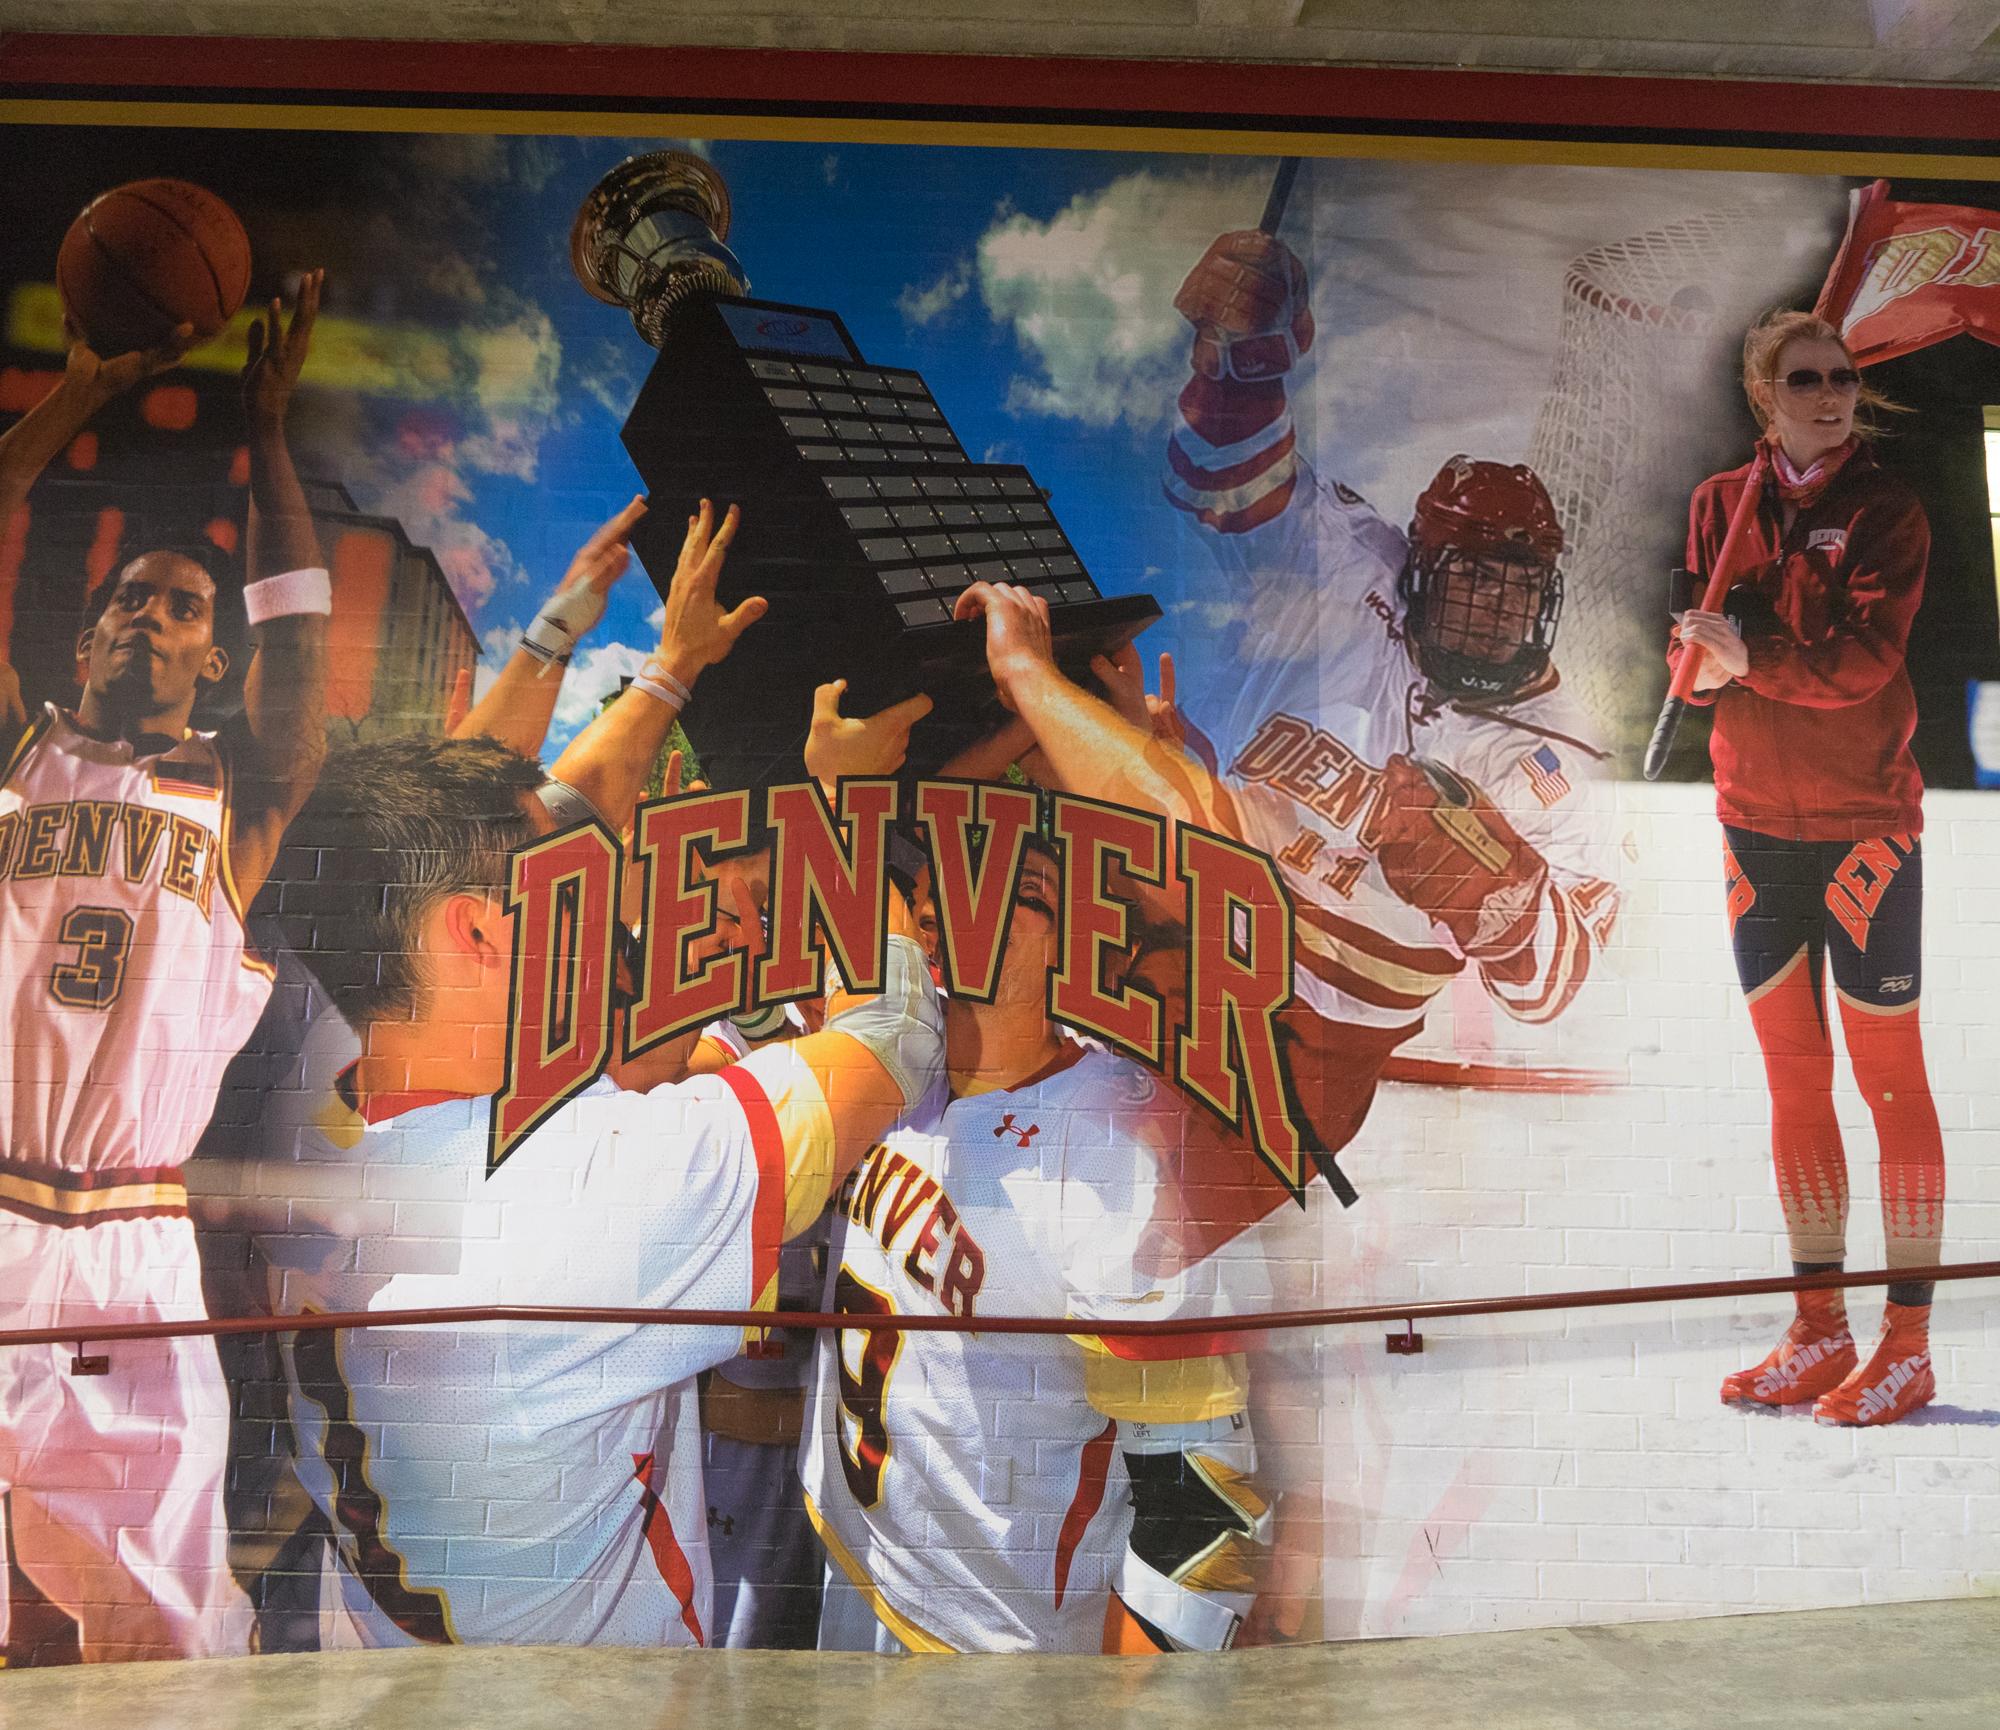 U of Denver (1).jpg